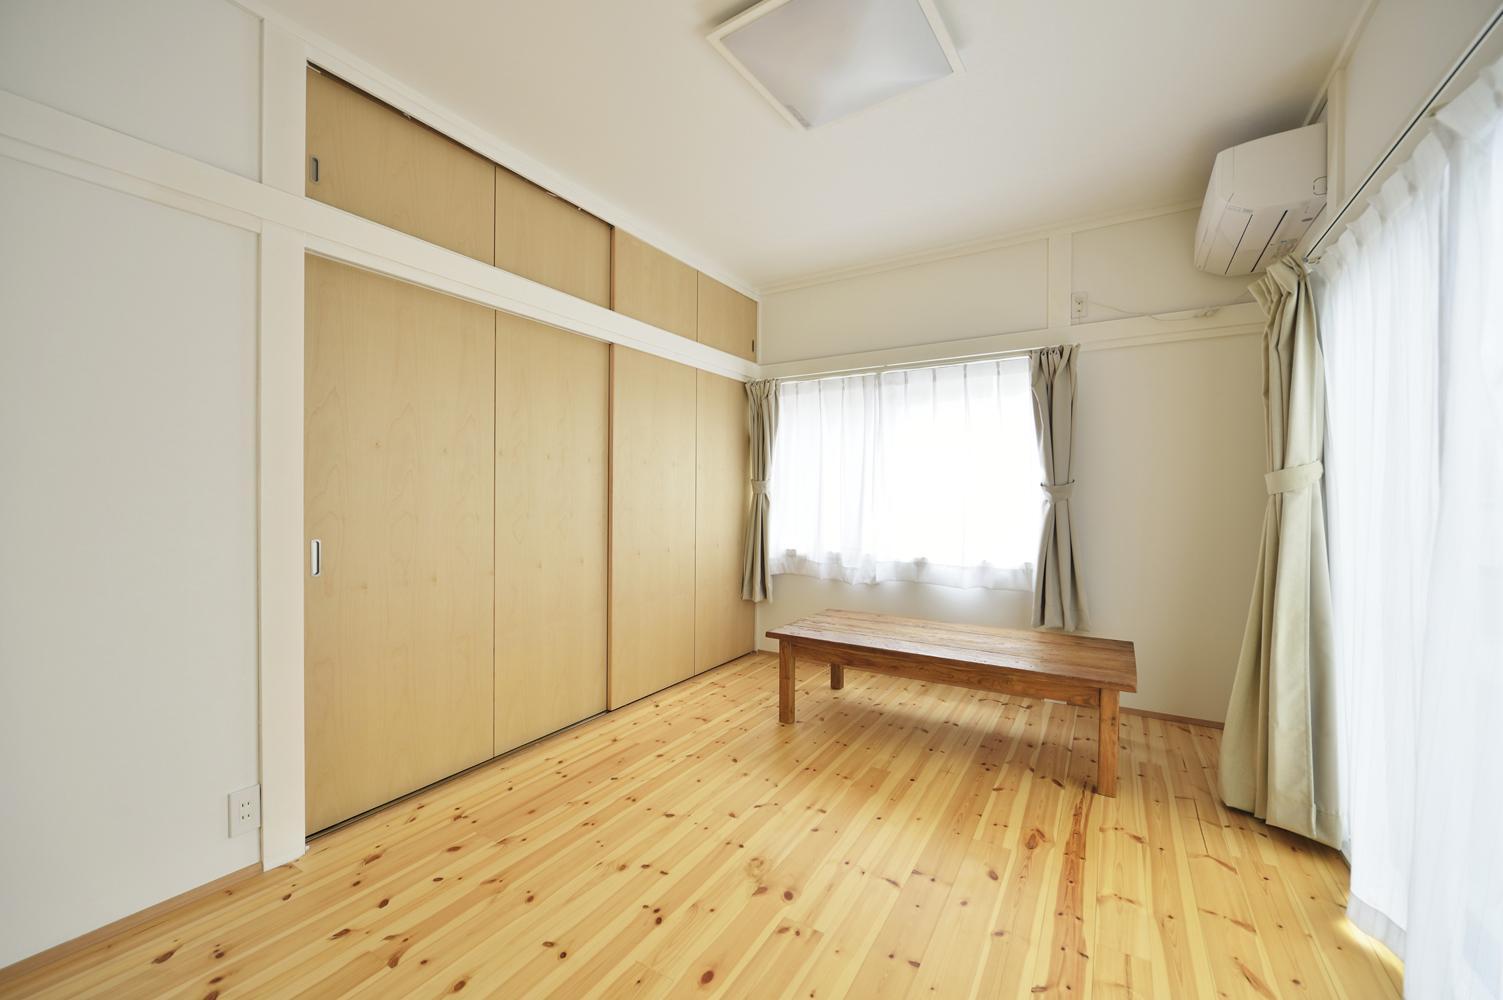 S邸・「解放感!」吹き抜けのある家の写真 明るく開放的な洋室